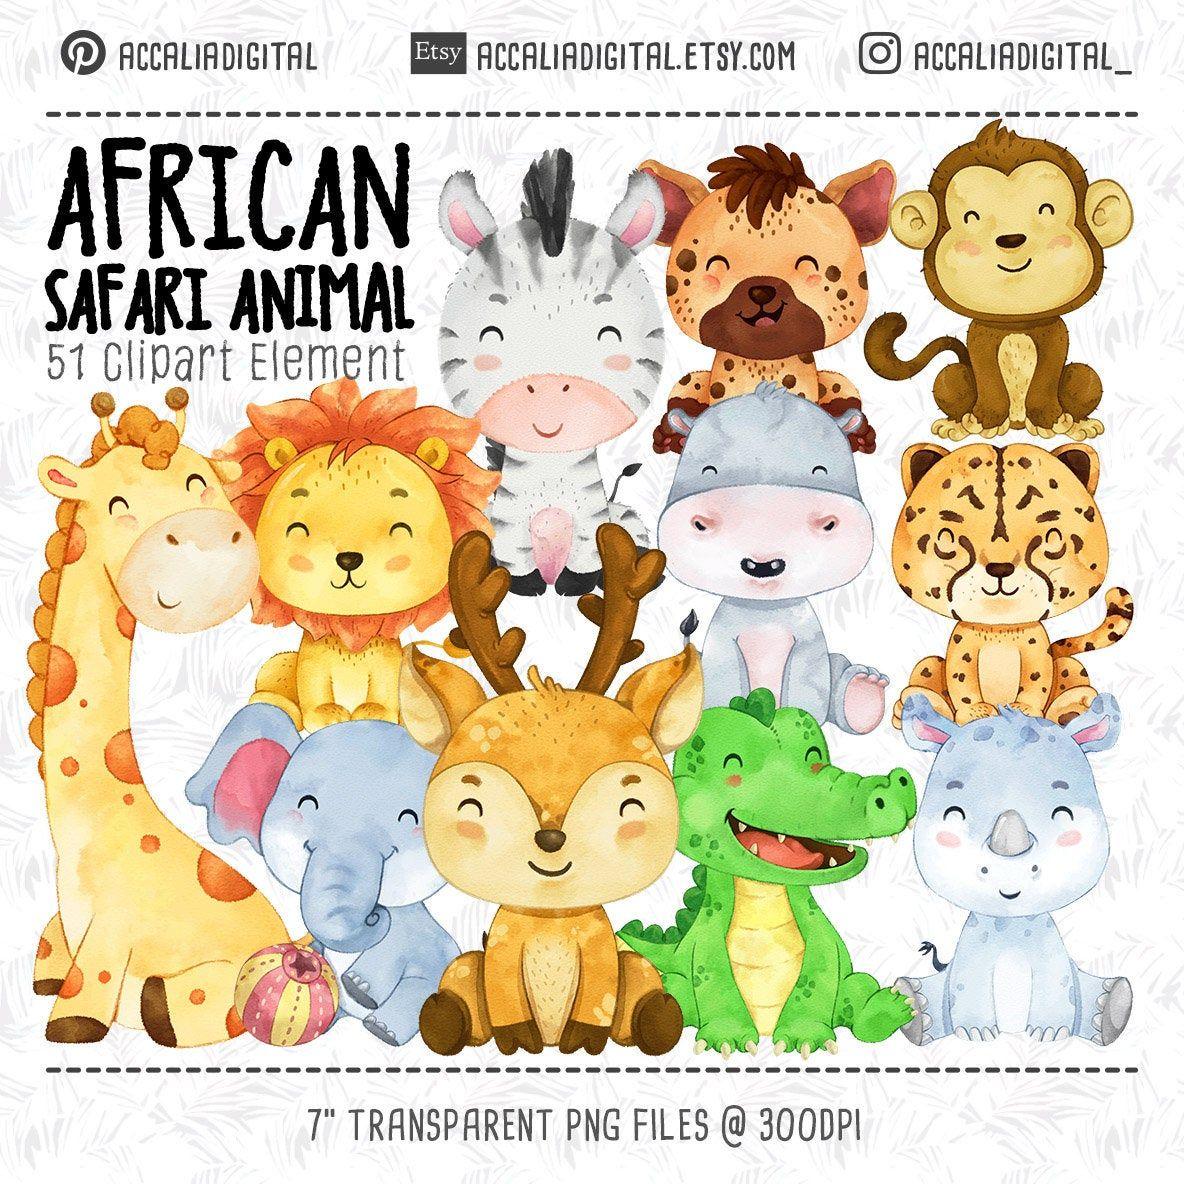 African Animals Clipart Watercolor Animal Animals Buddies Etsy Animal Clipart African Animals Animal Nursery Decor